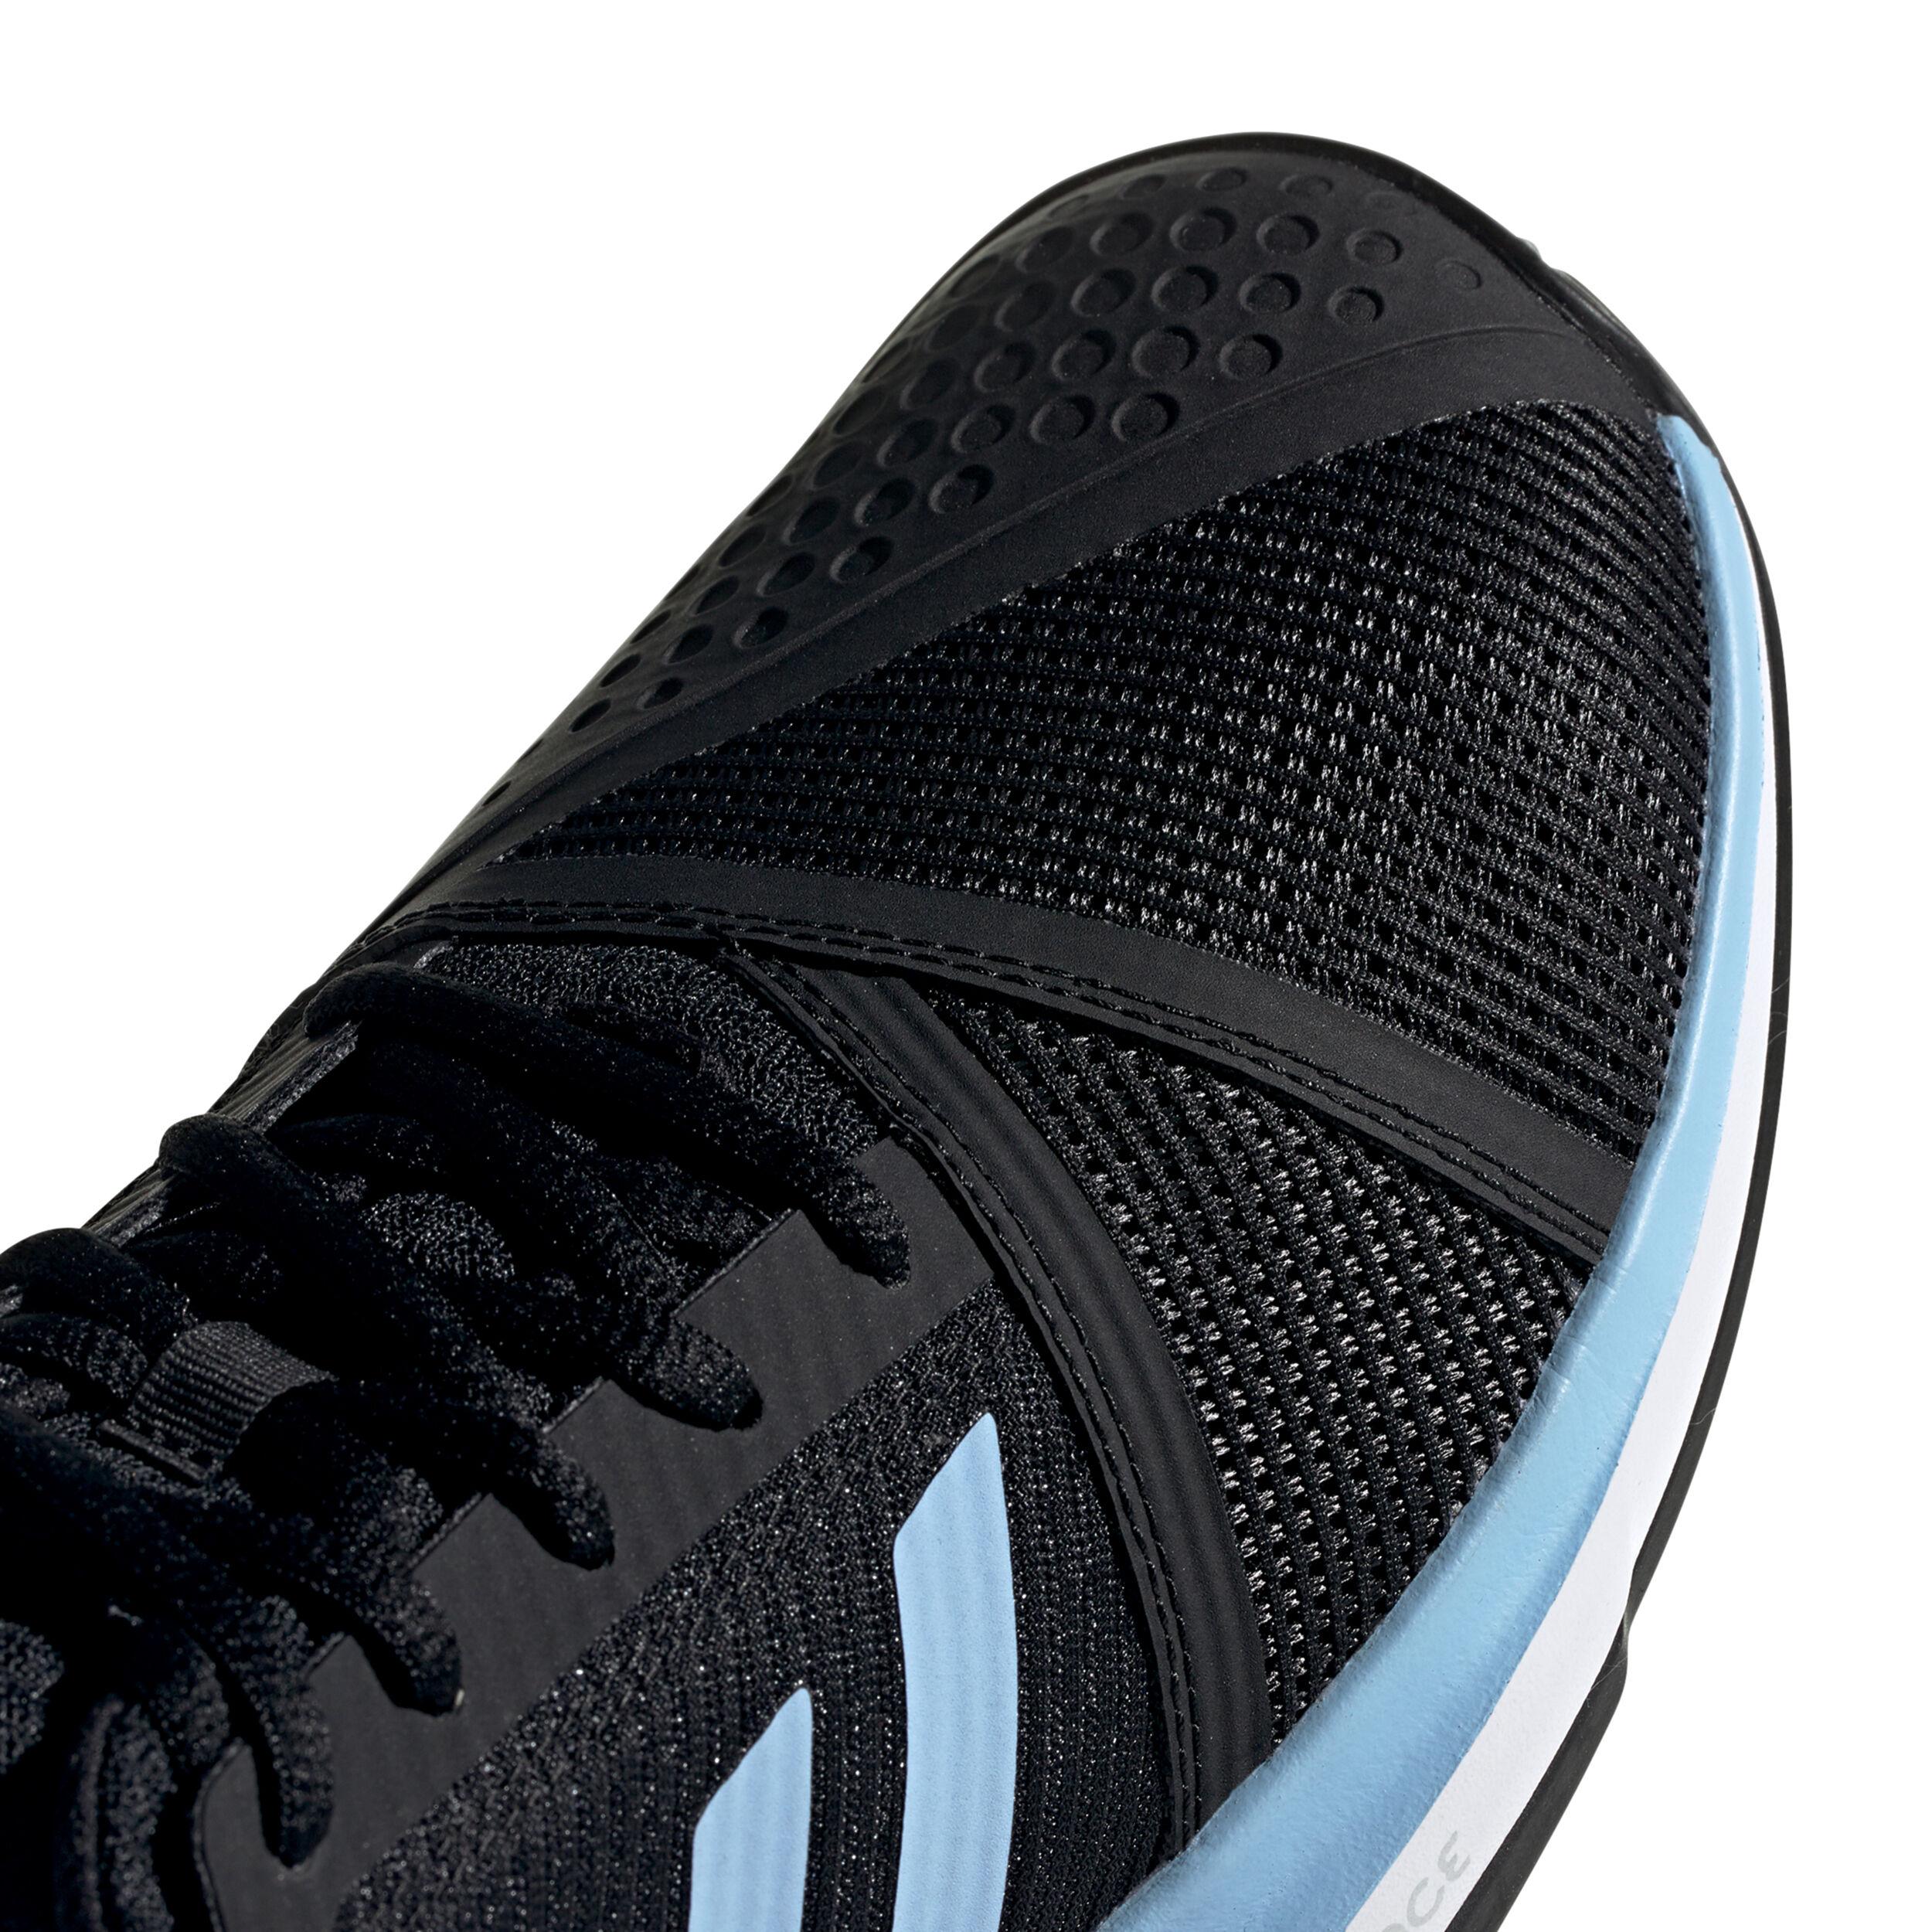 Chaussures Adidas Femme Courtjam Bounce Terre Battue Noires